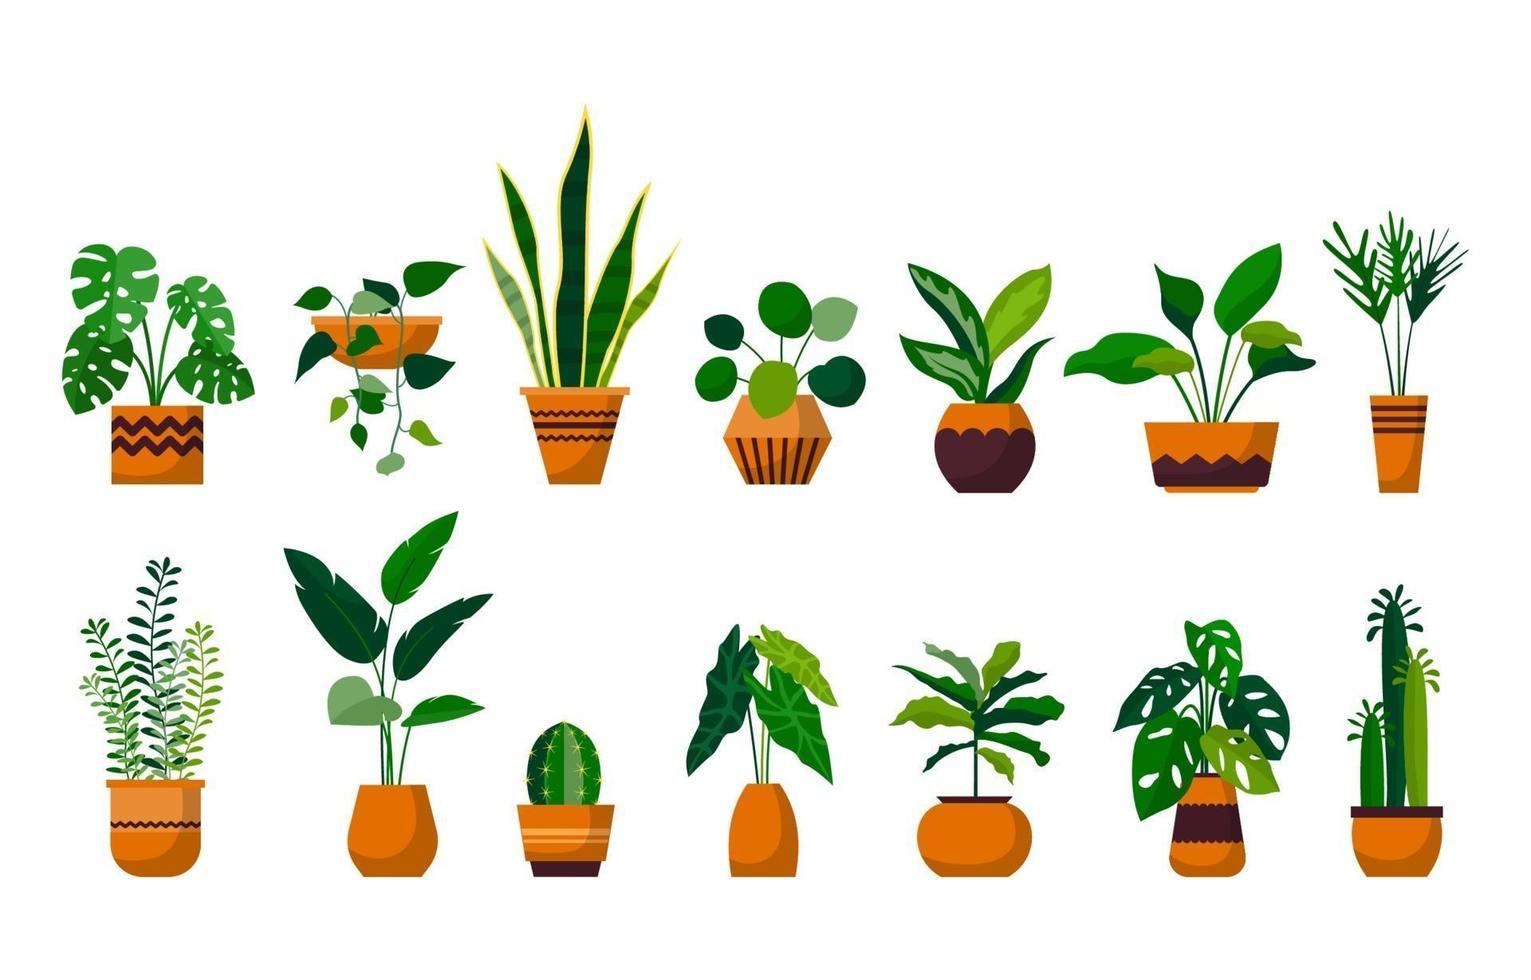 Zimmerpflanzengrün dekorativer Pflanzengarten botanischer Vektorsatz vektor